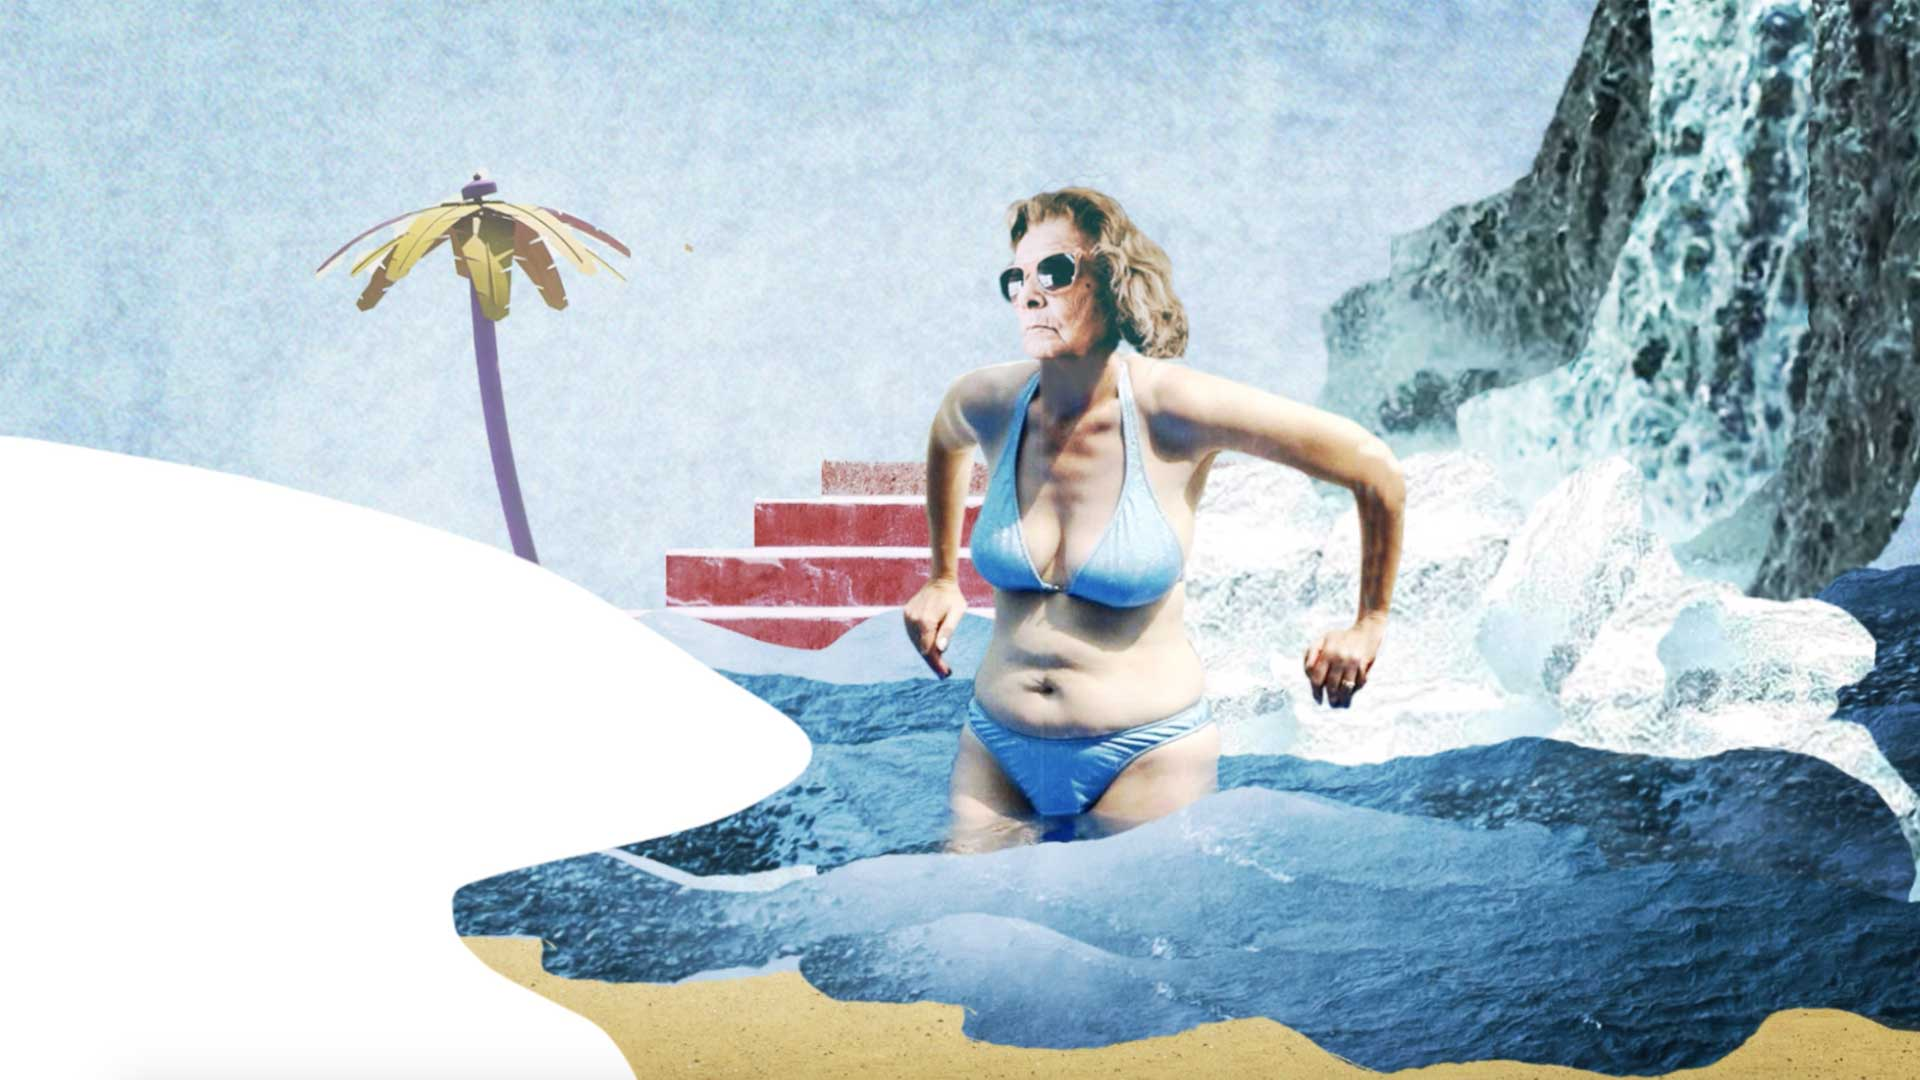 femme cascade photomontage baignade plage escalier palmier